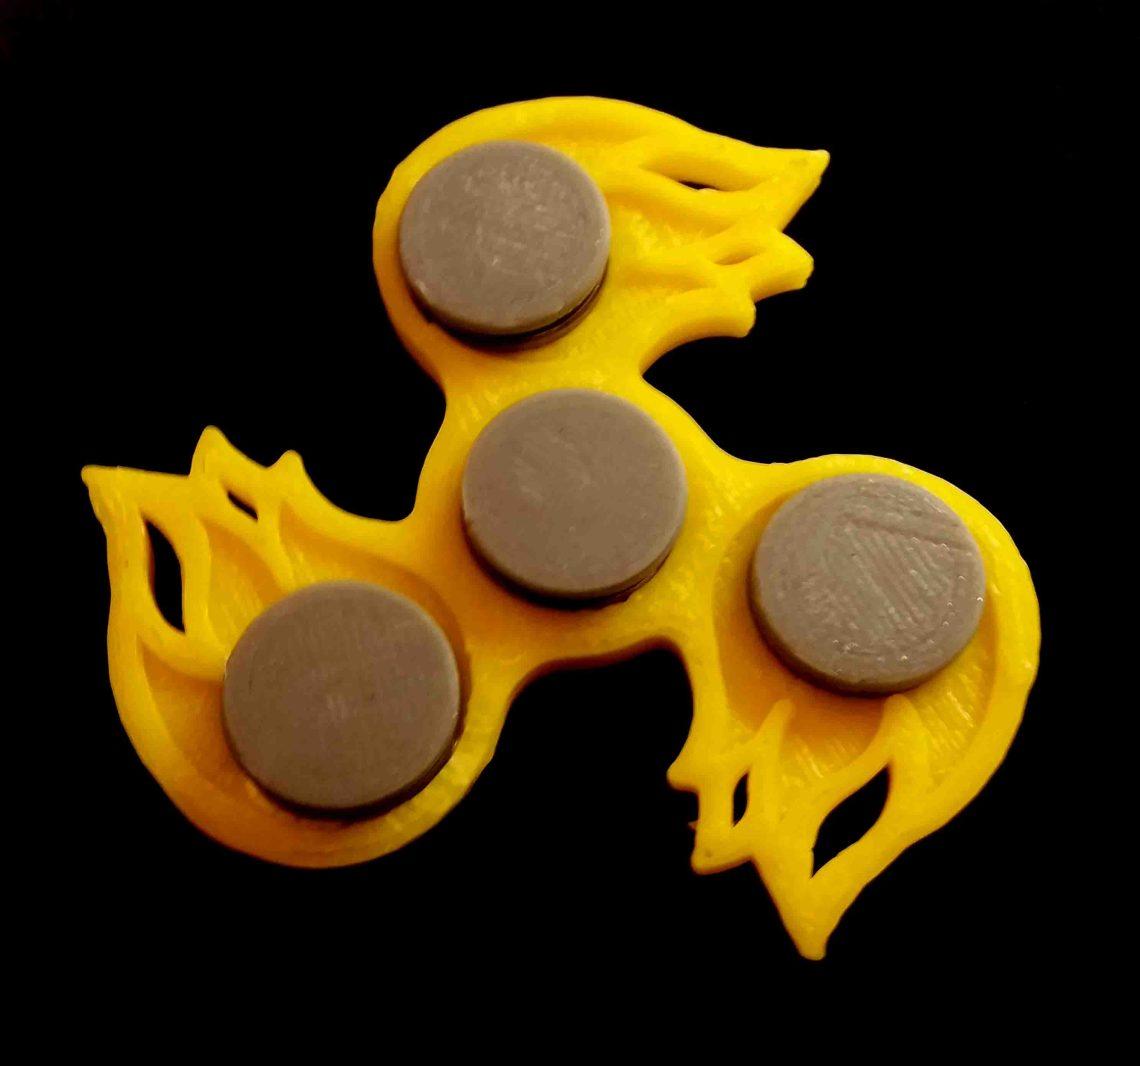 FireBall Fidget Spinner